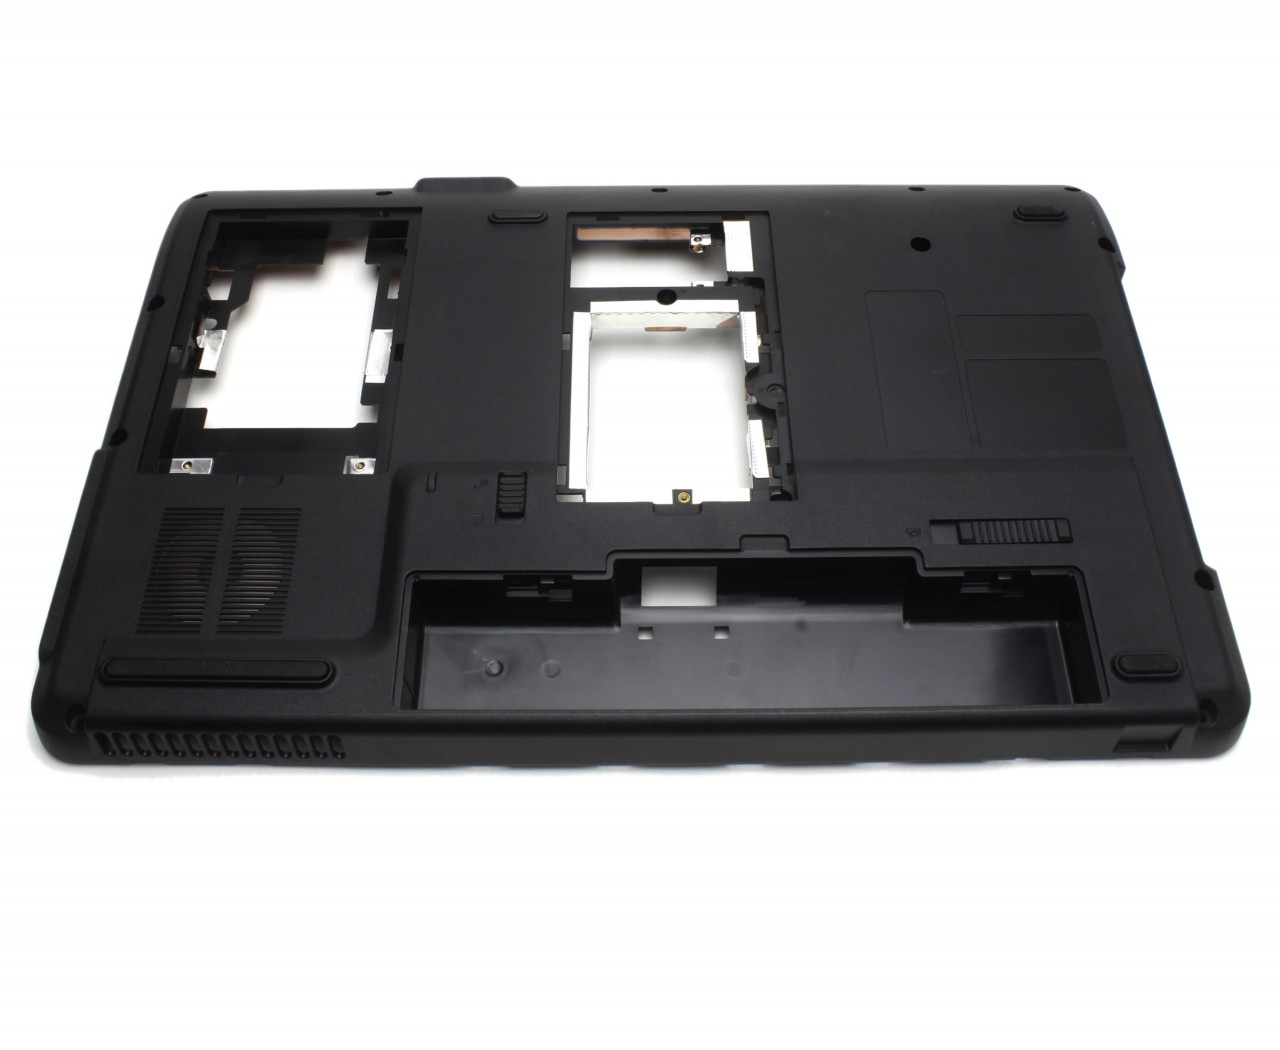 Bottom Case Emachines E630 Carcasa Inferioara Neagra imagine powerlaptop.ro 2021